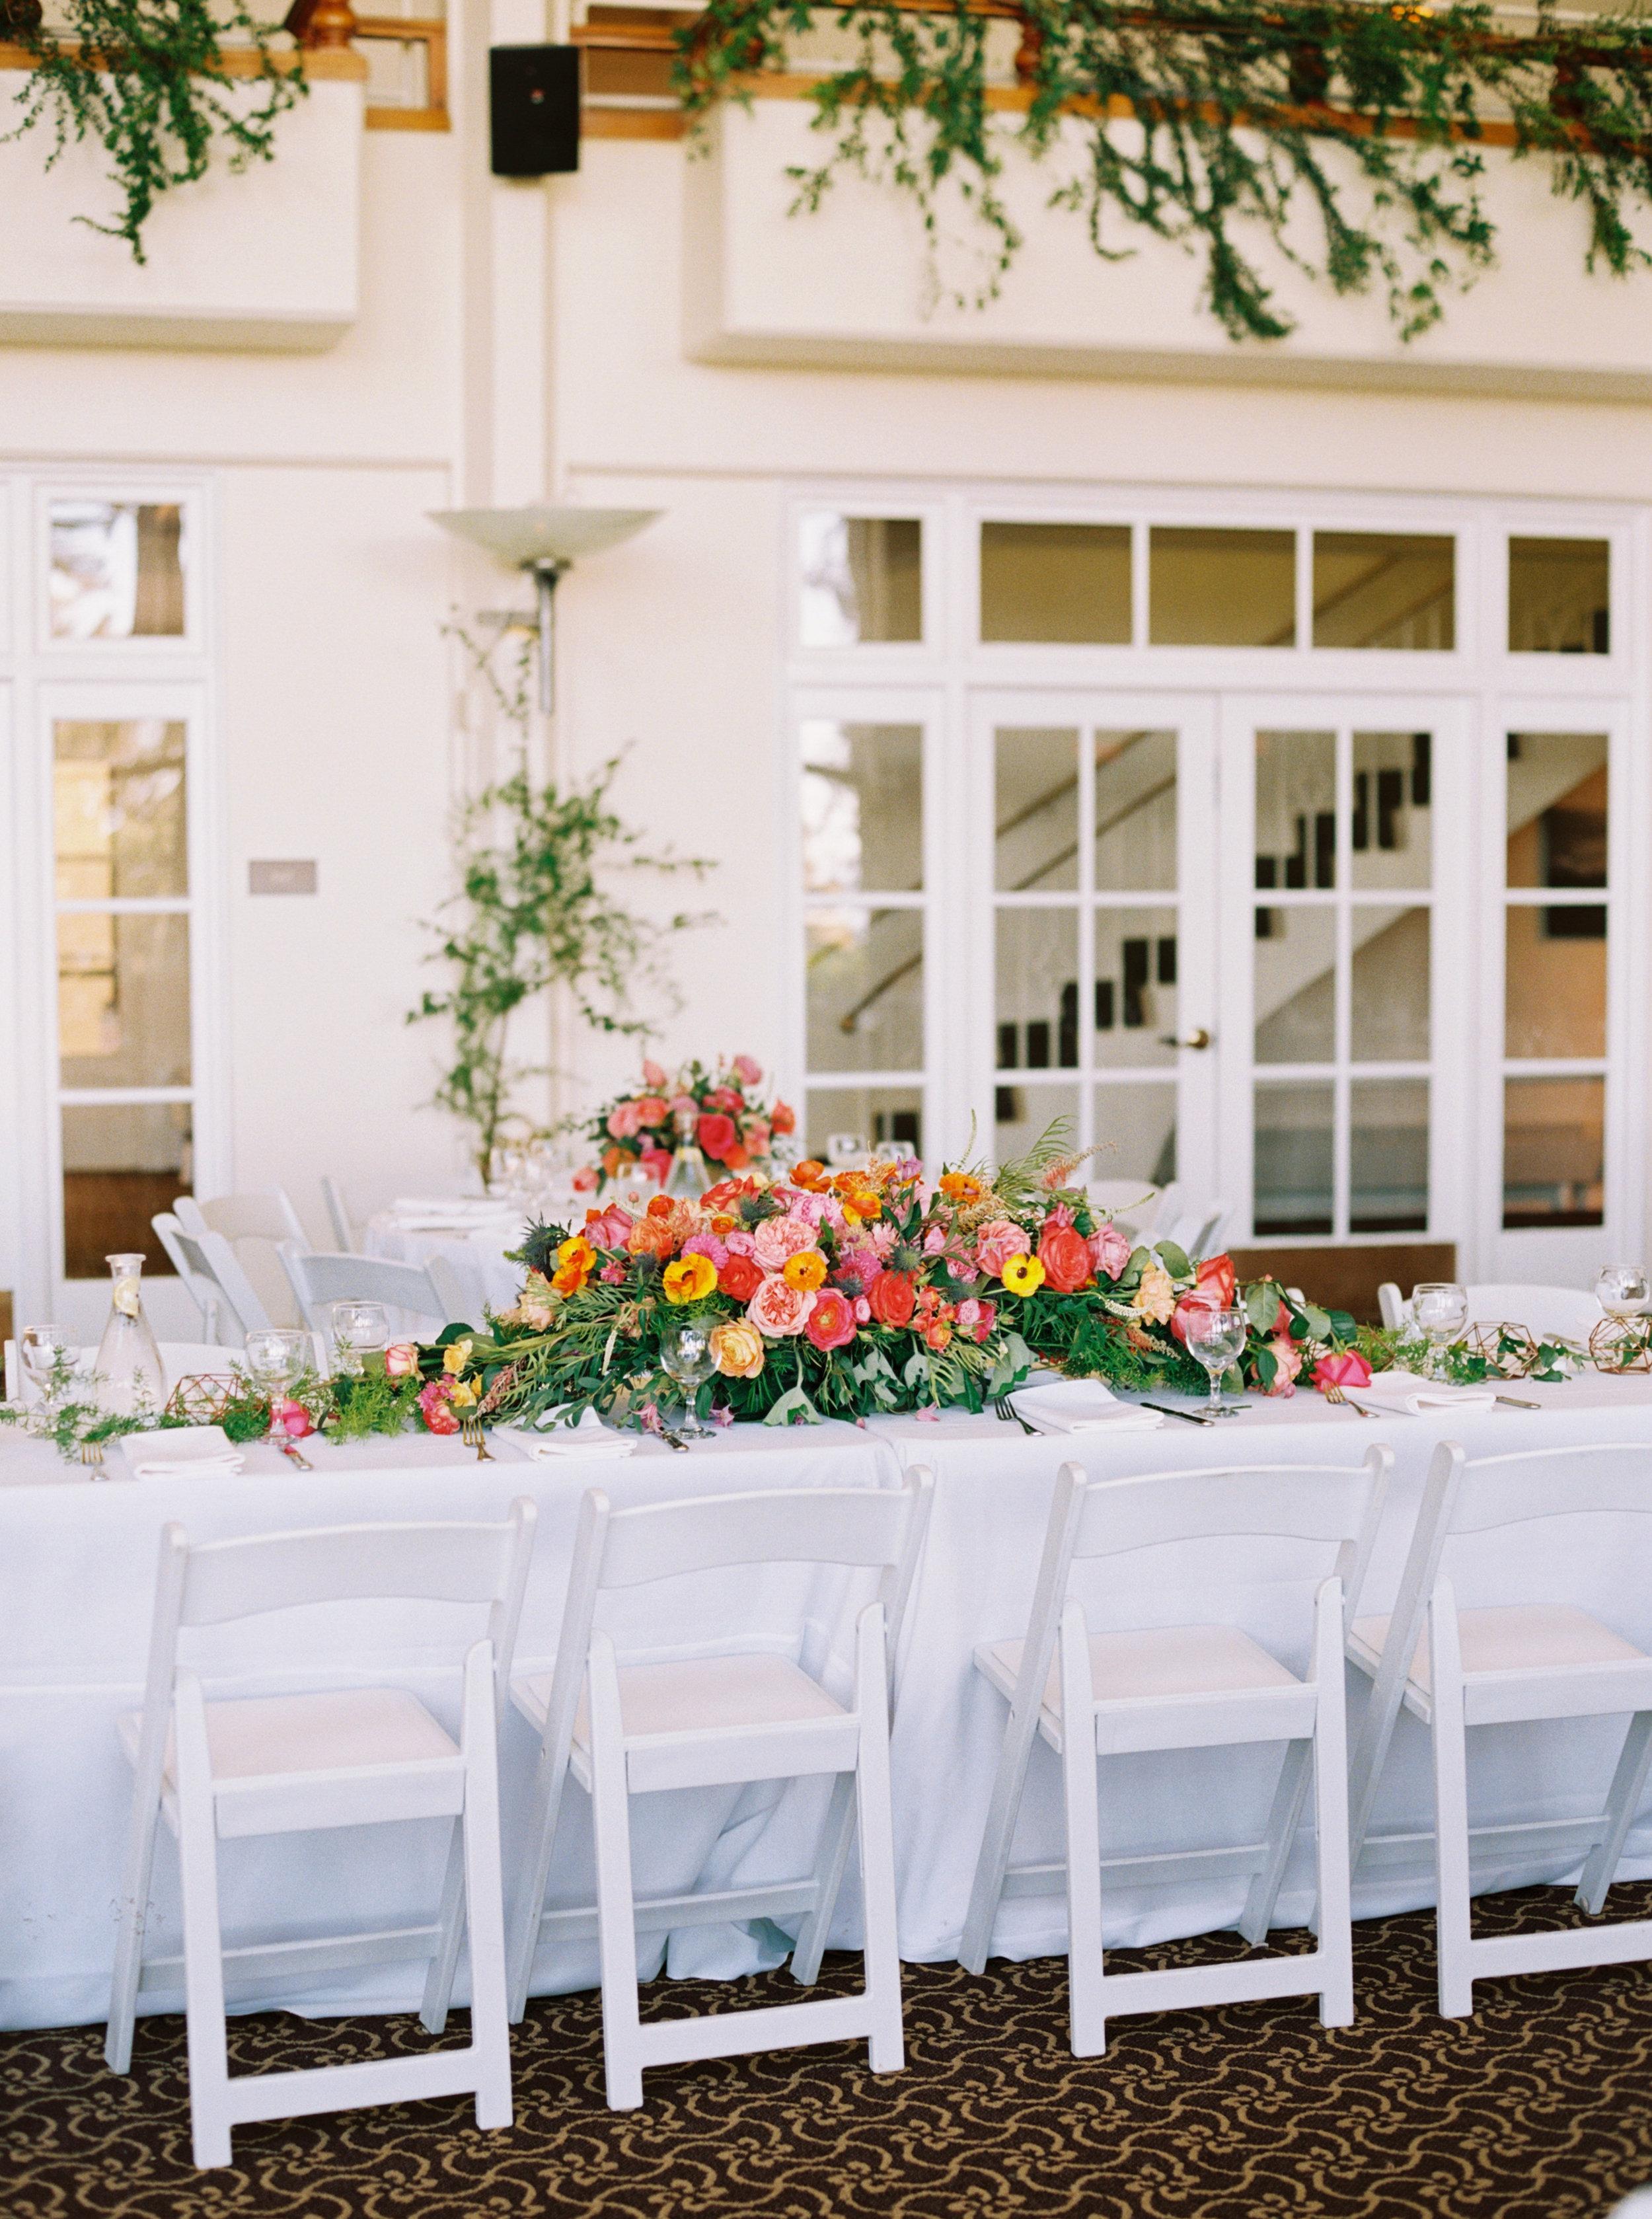 Tucker_Kristina_Wedding_Presidio_San_Francisco_Abigail_Malone_Photography-834.jpg